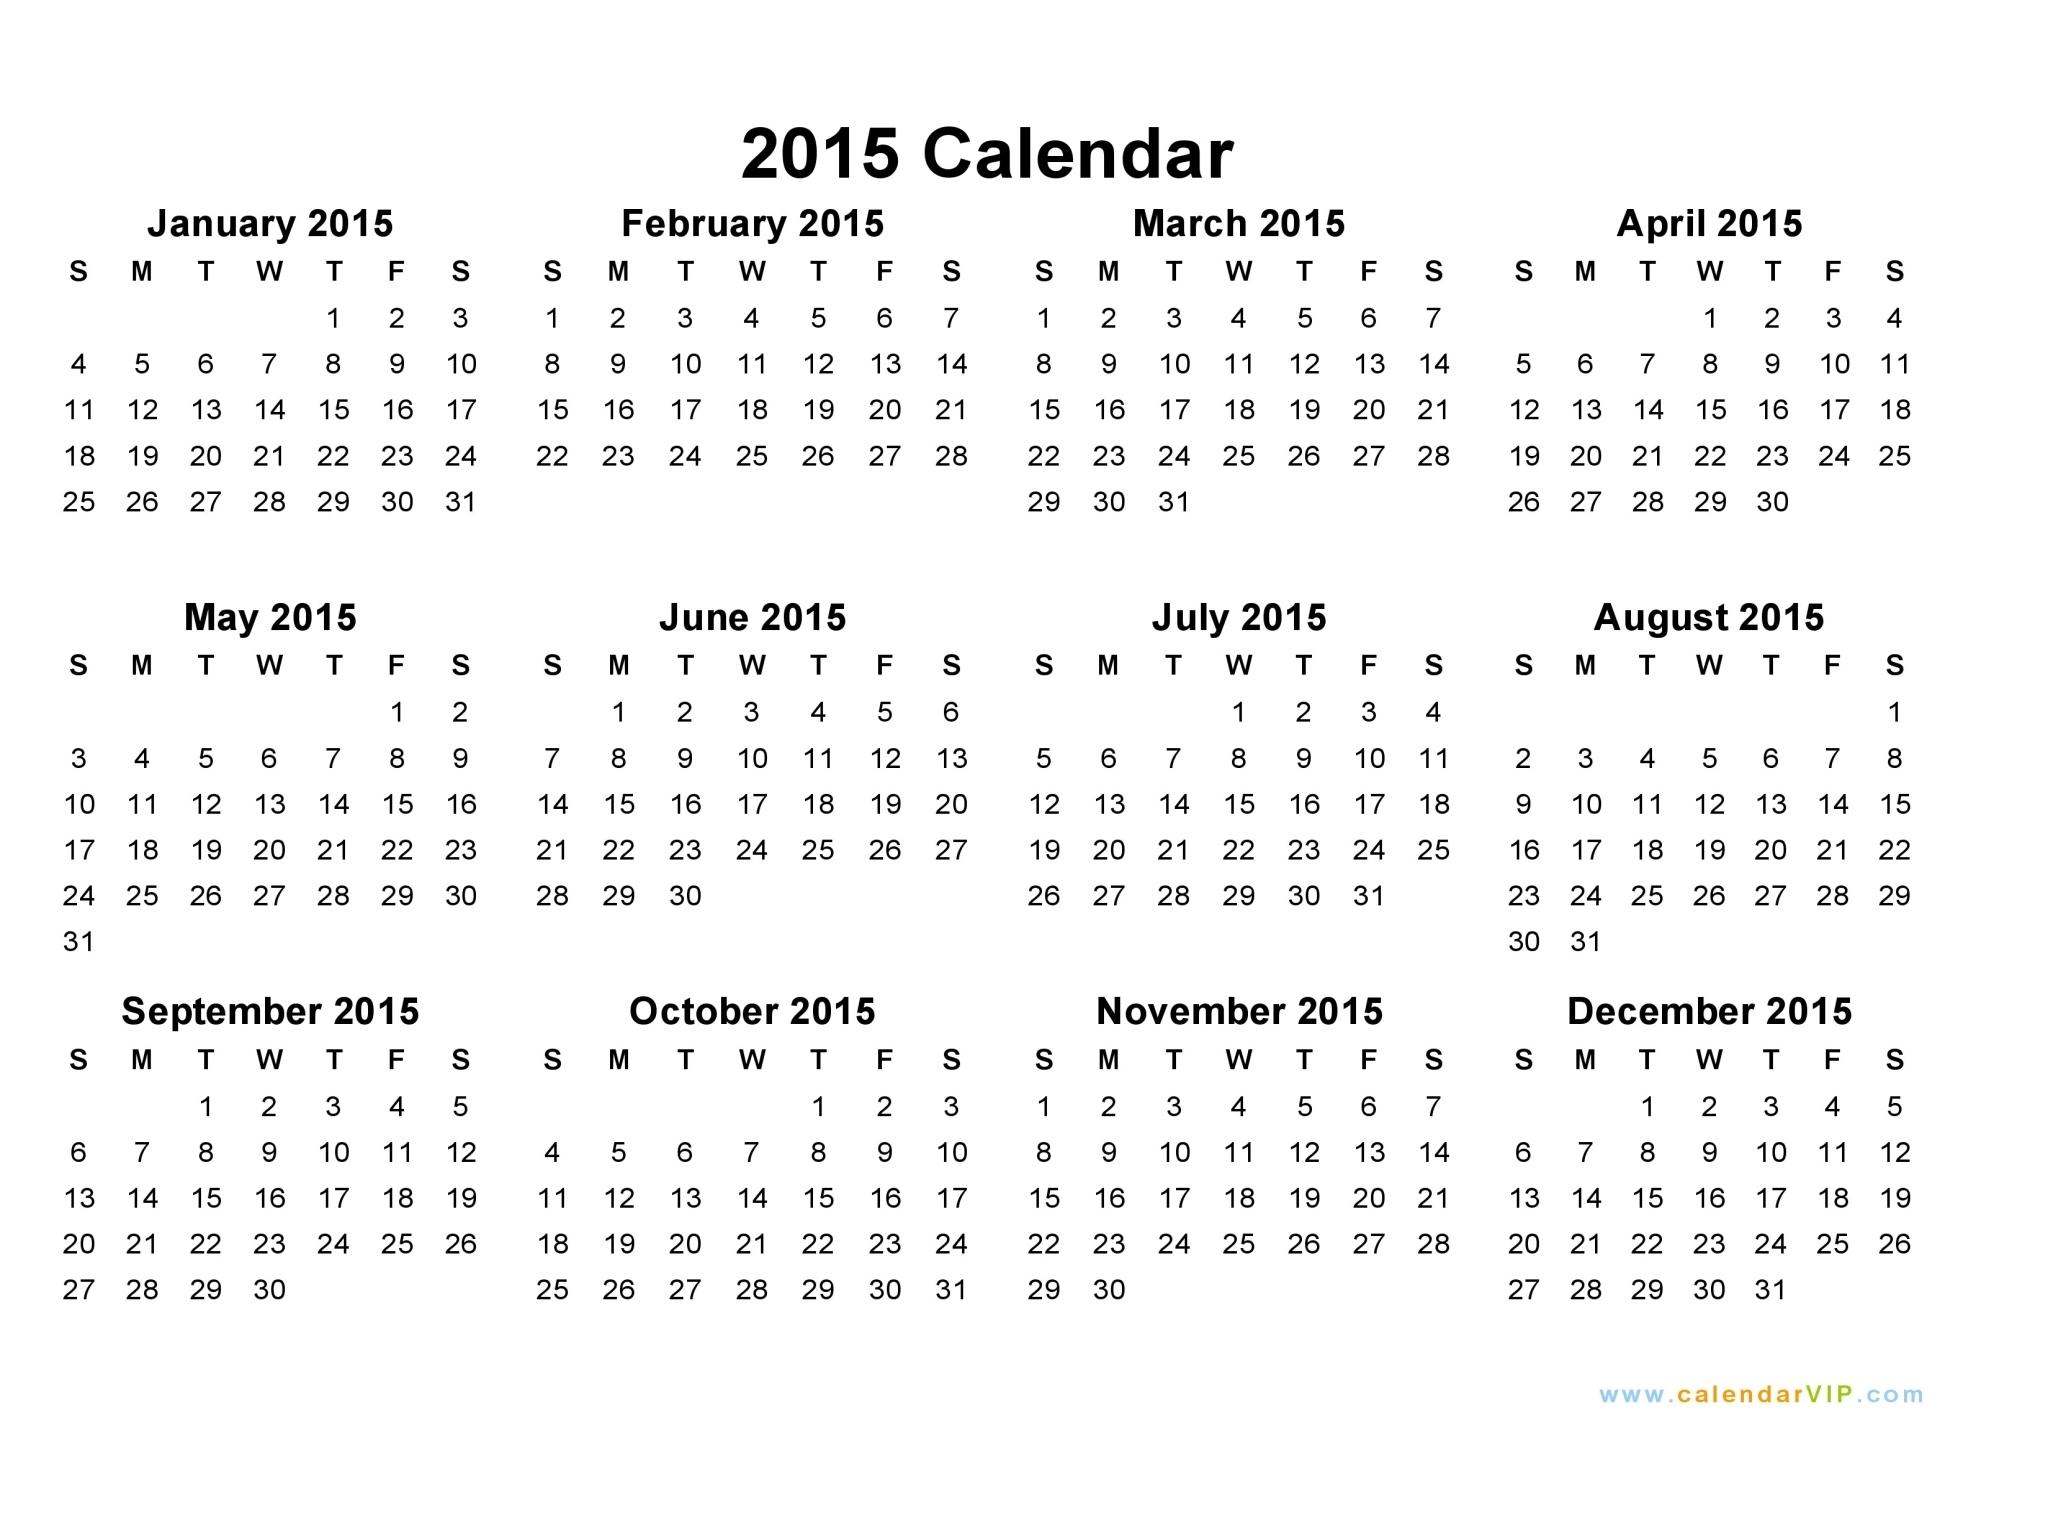 2015 Calendar - Blank Printable Calendar Template In Pdf